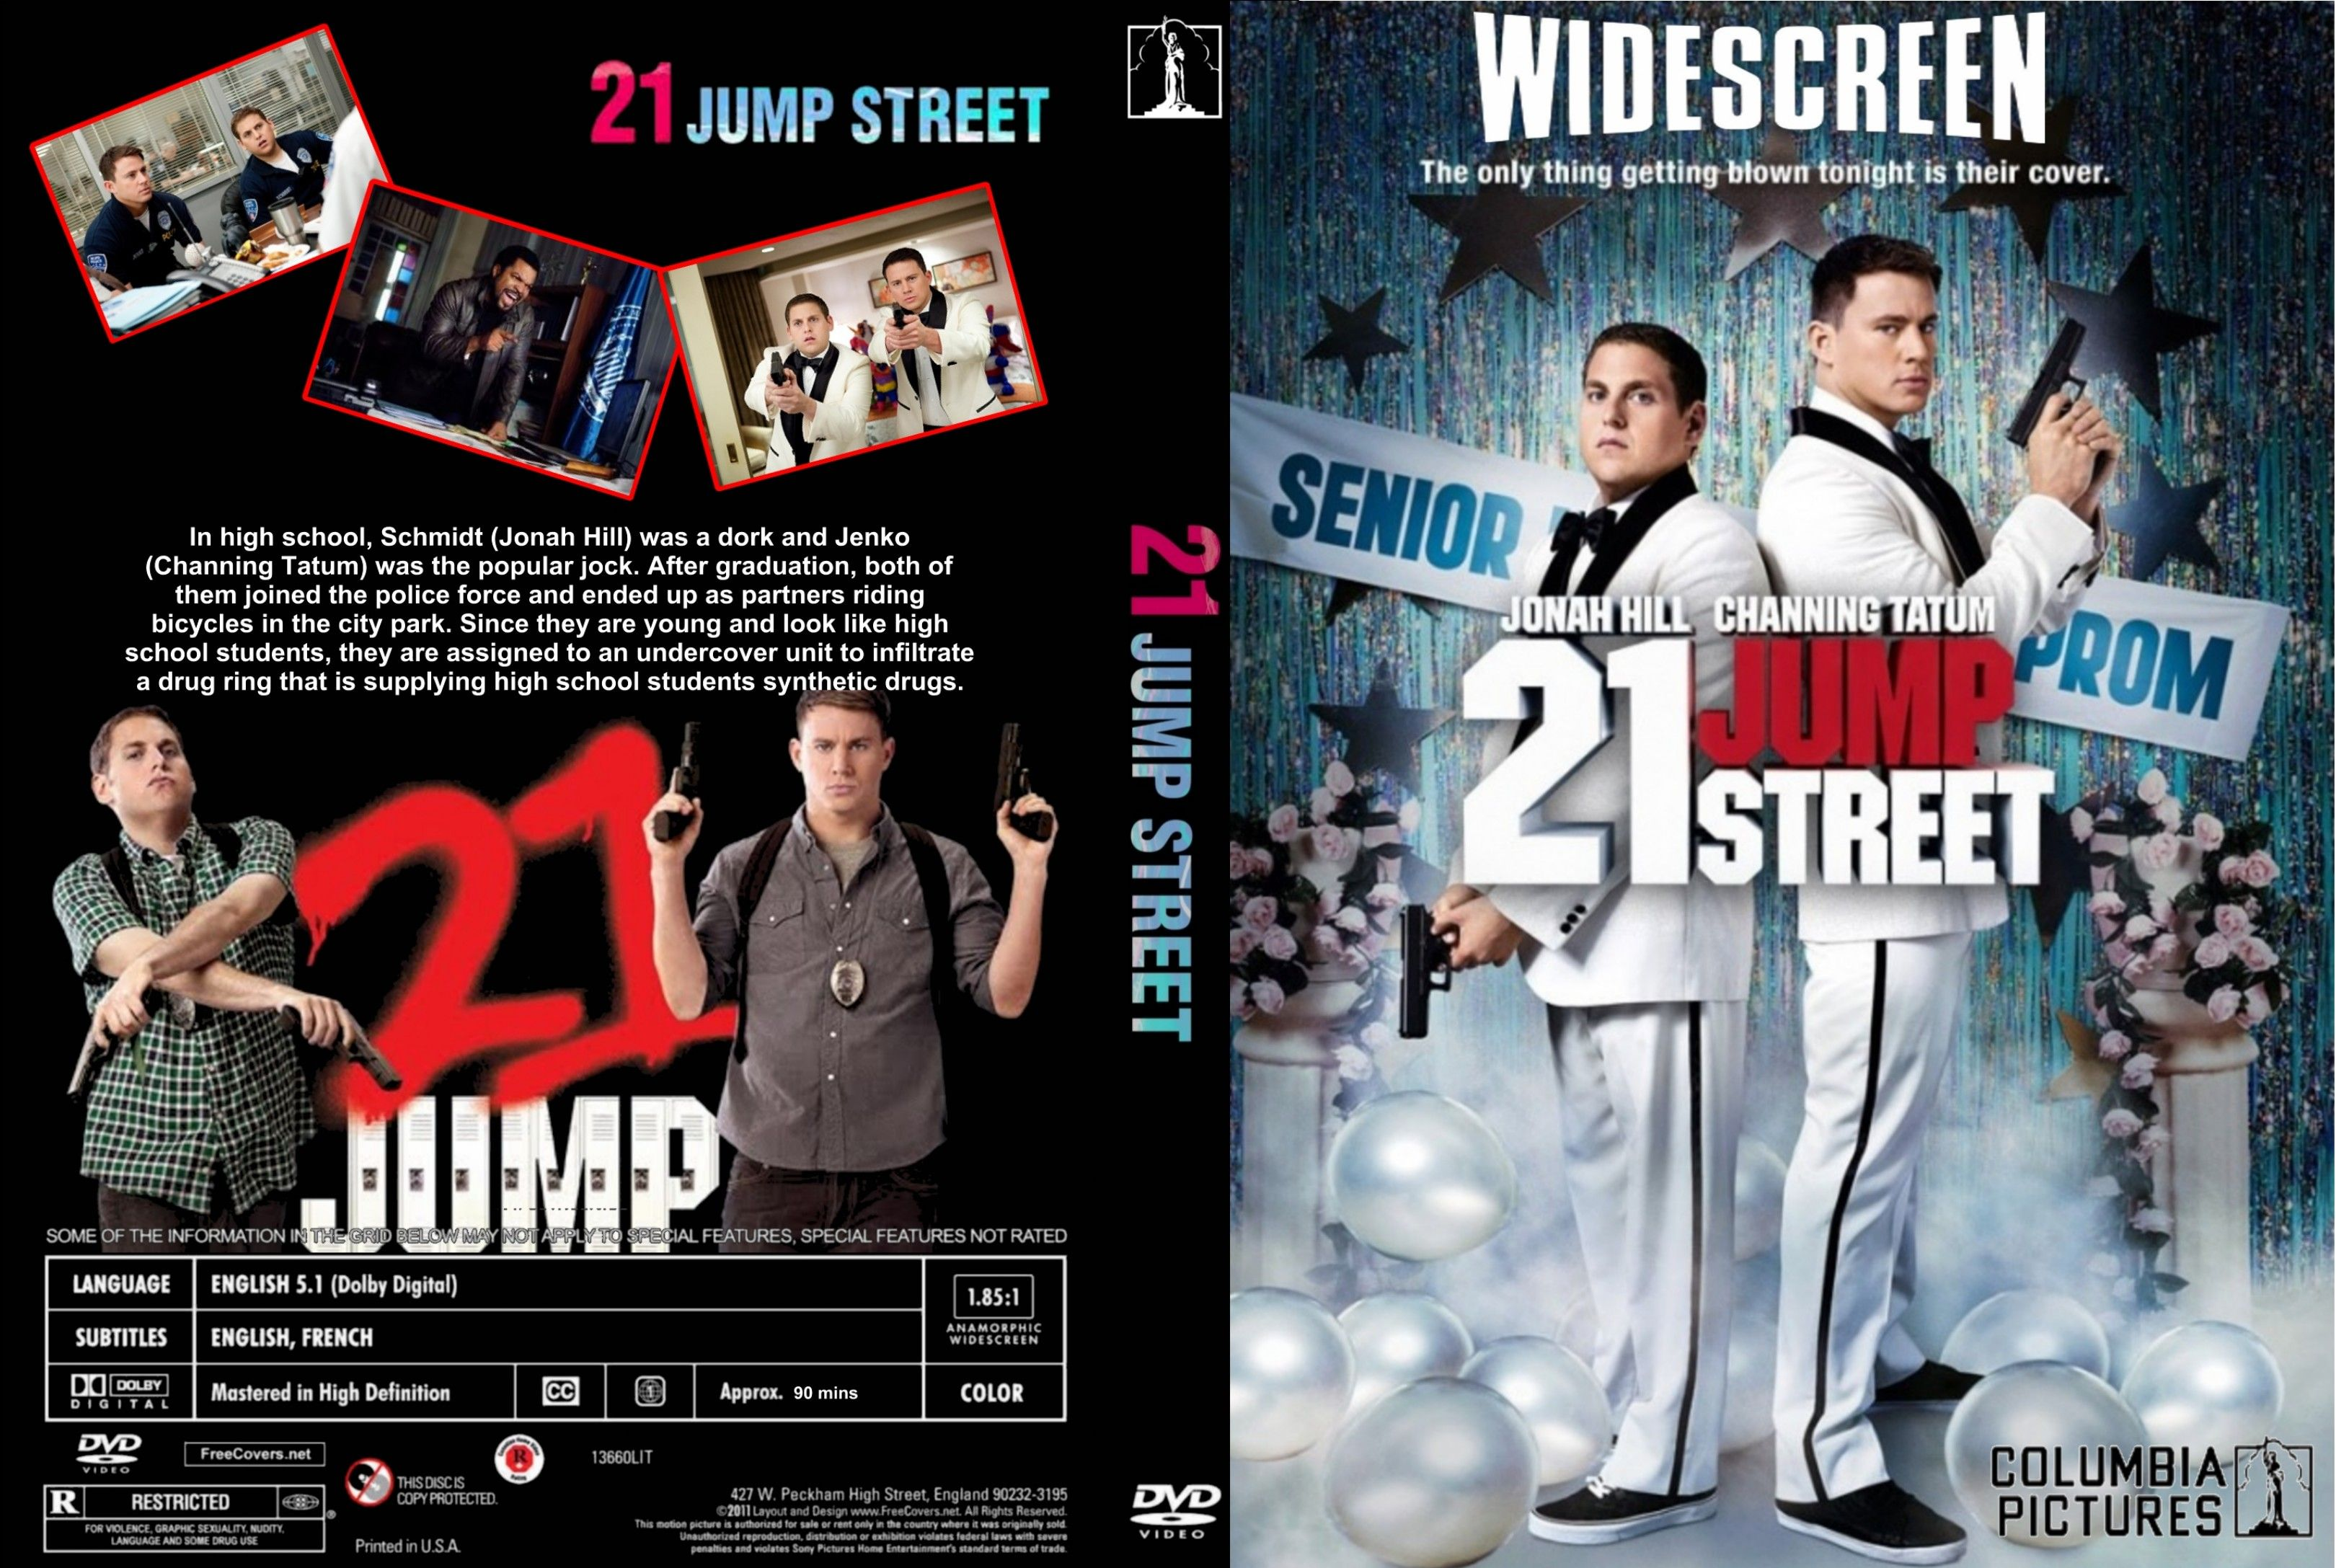 Covers Box Sk 21 Jump Street 2012 High Quality Dvd Blueray 21 Jump Street Dvd Covers Movie Covers